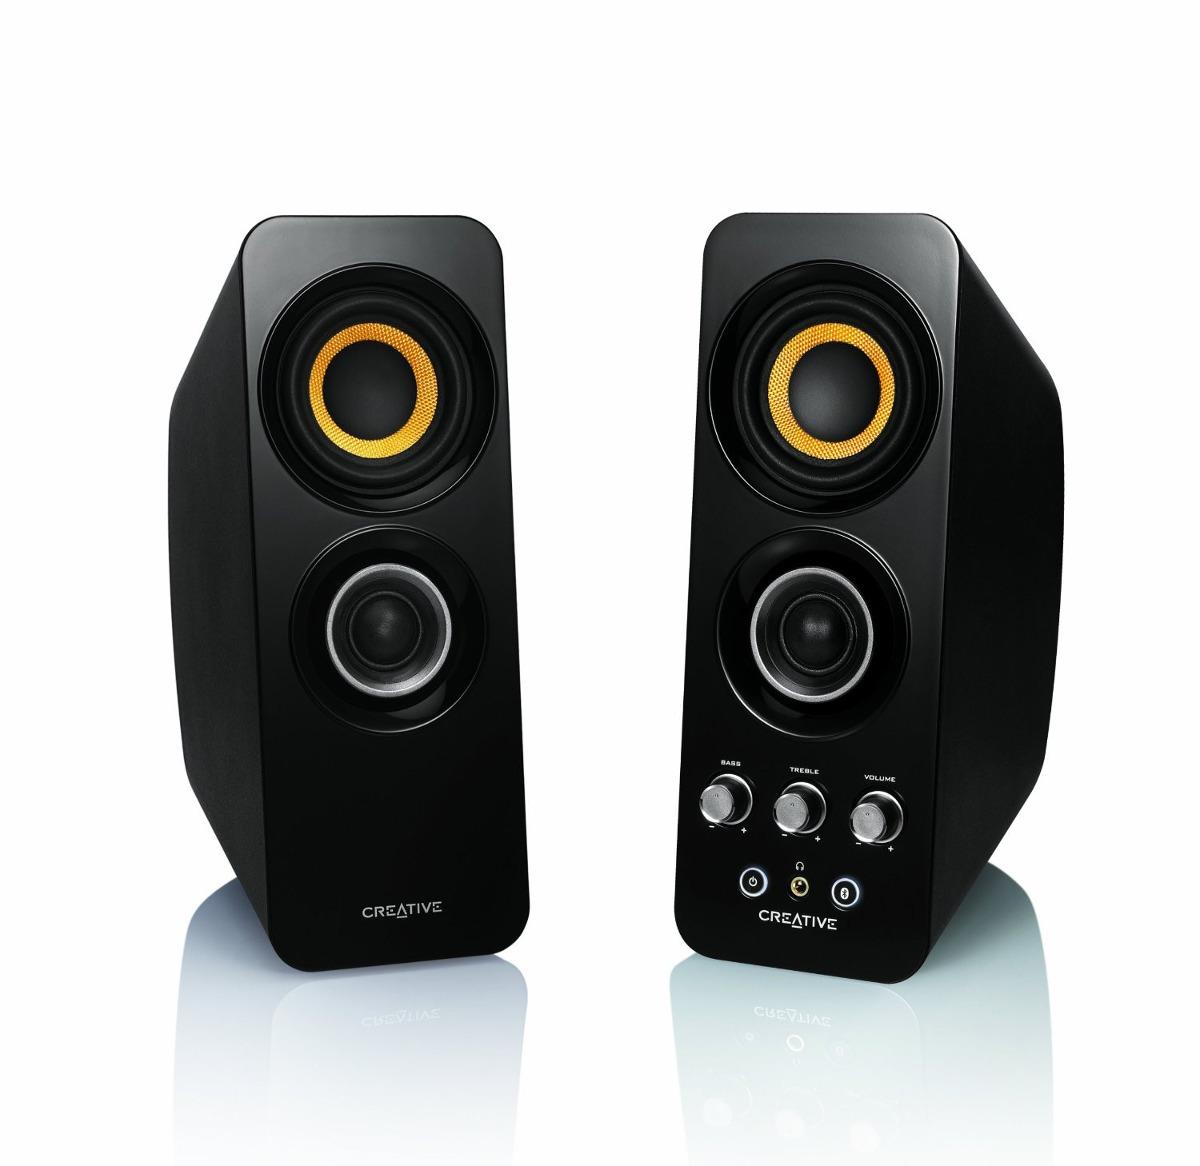 Bocinas Para Pc Creative T30 Inalambricas Bluetooth 3.0, Nfc